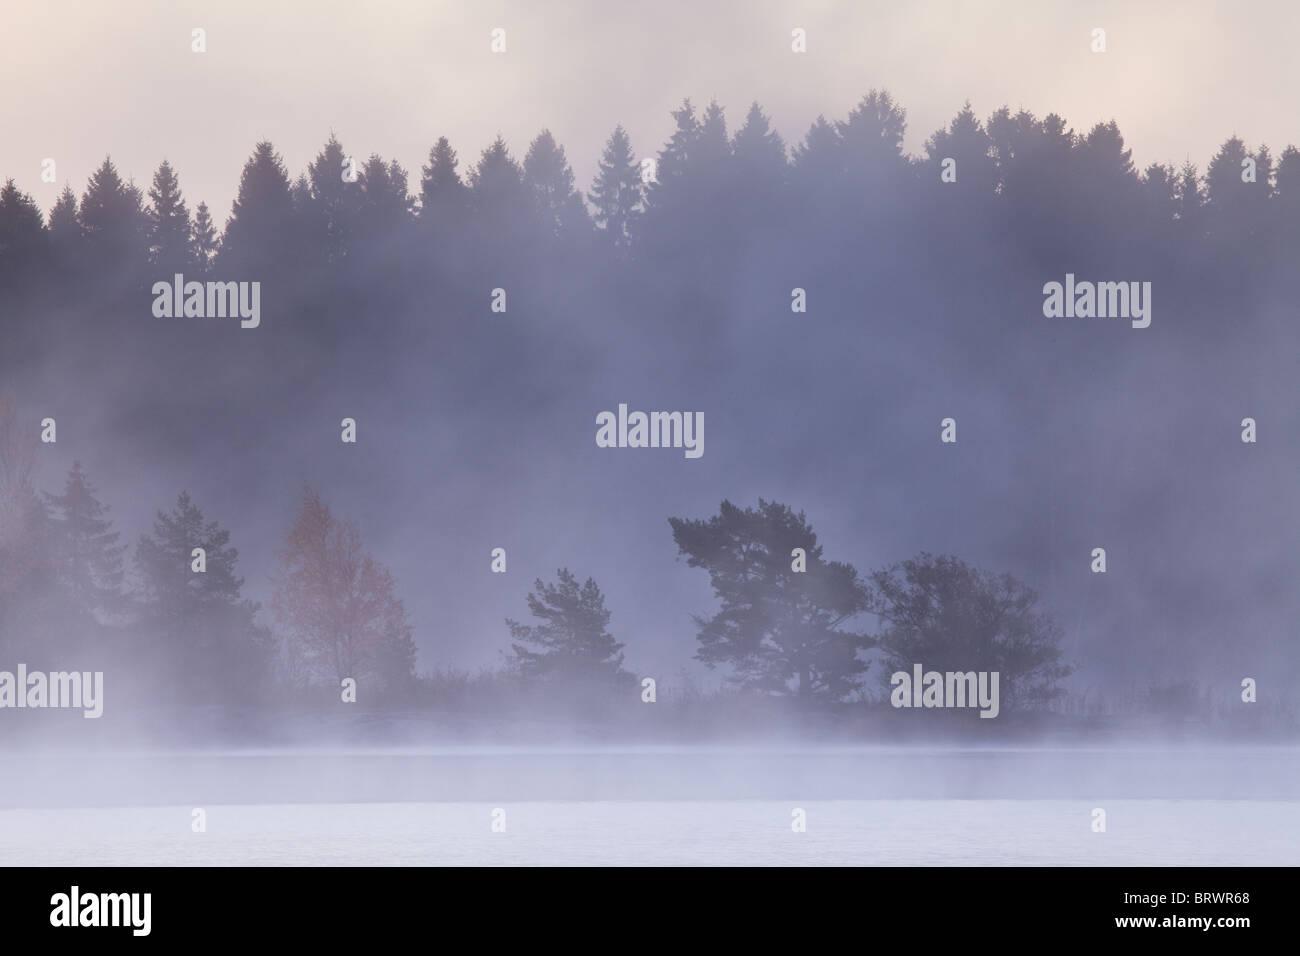 Early Morning mist dopo una gelida notte di ottobre nel lago Vansjø, Østfold fylke, Norvegia. Foto Stock